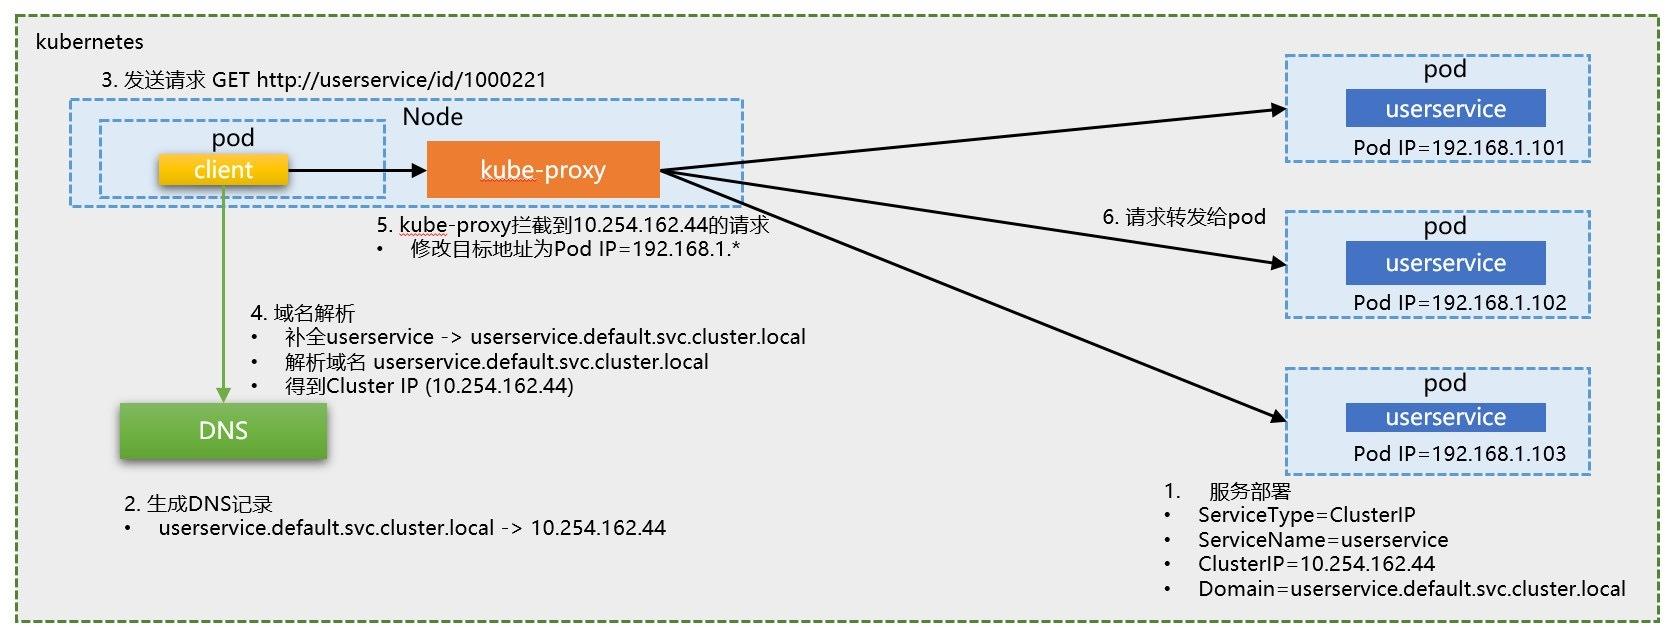 Kubernetes DNS寻址